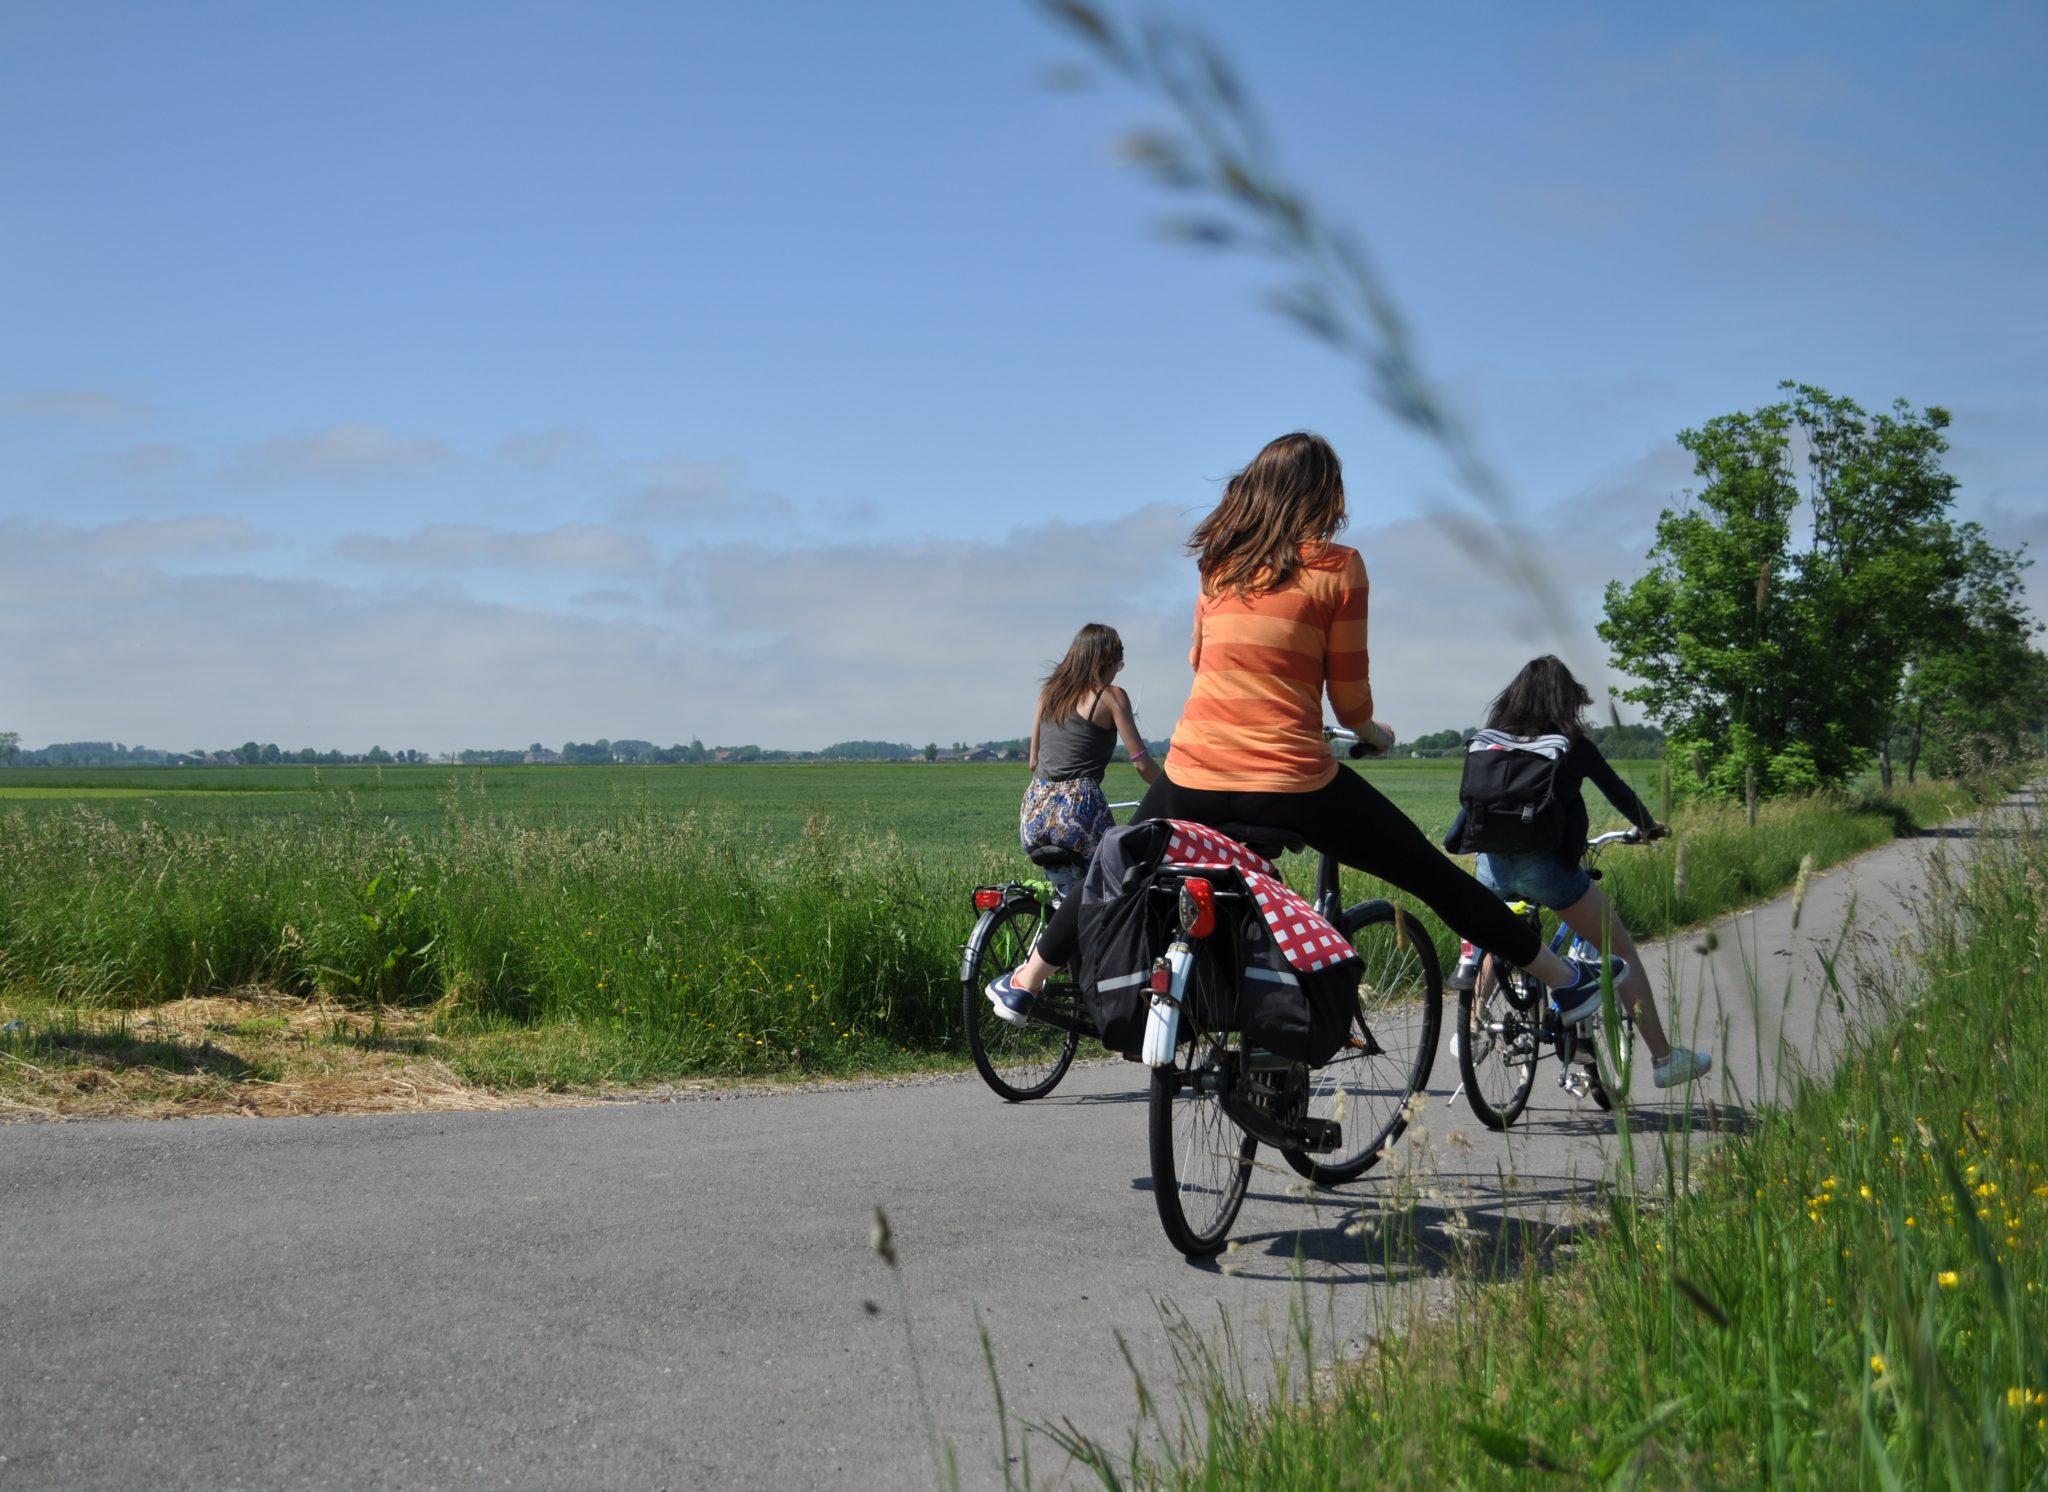 4 Girls on a Bike Trip to the North Sea